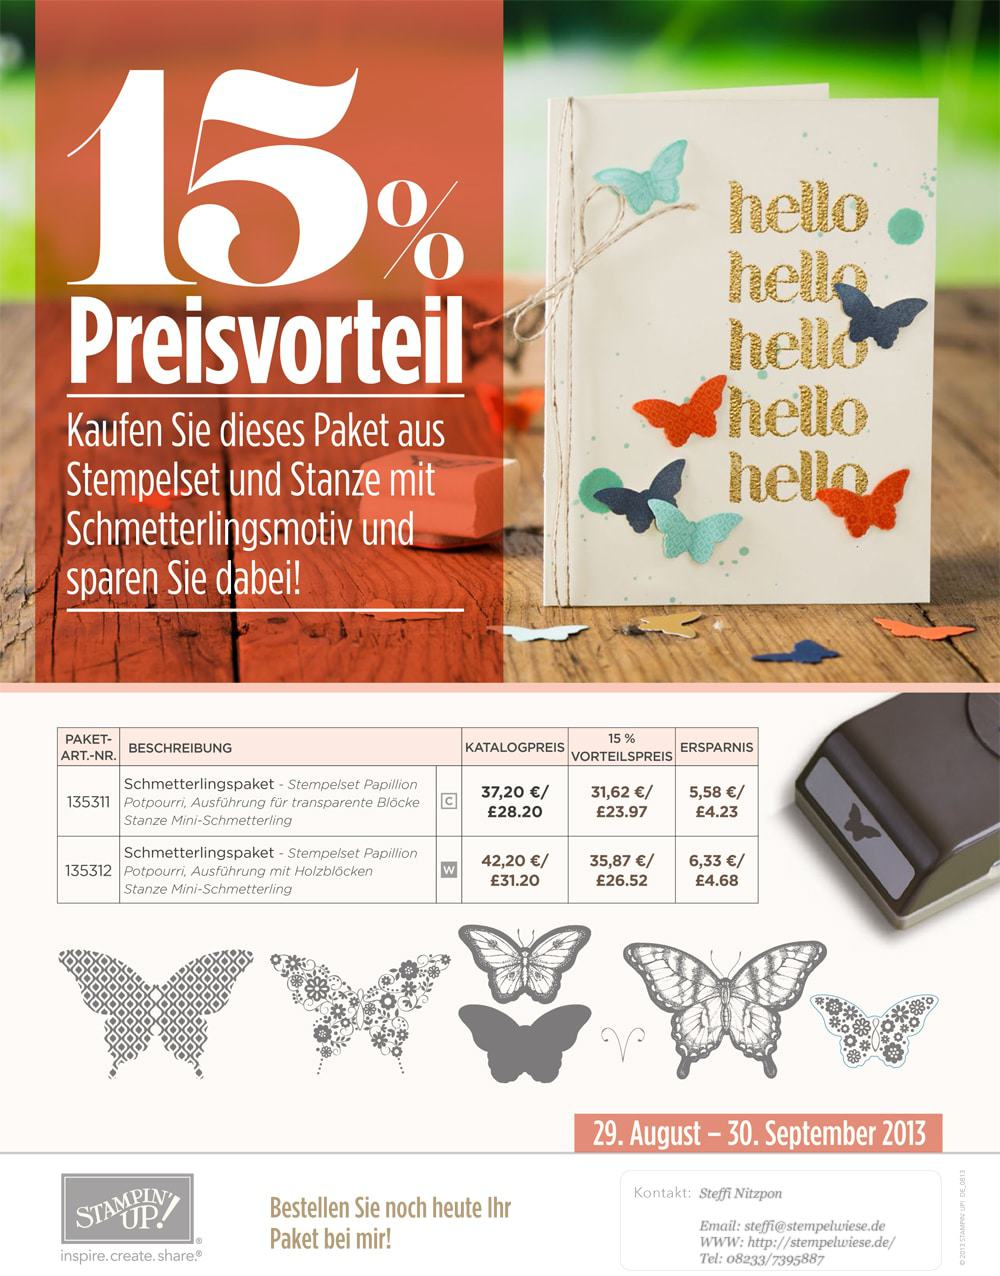 mini-schmetterling-papillon-potpourri-rabatt-300913